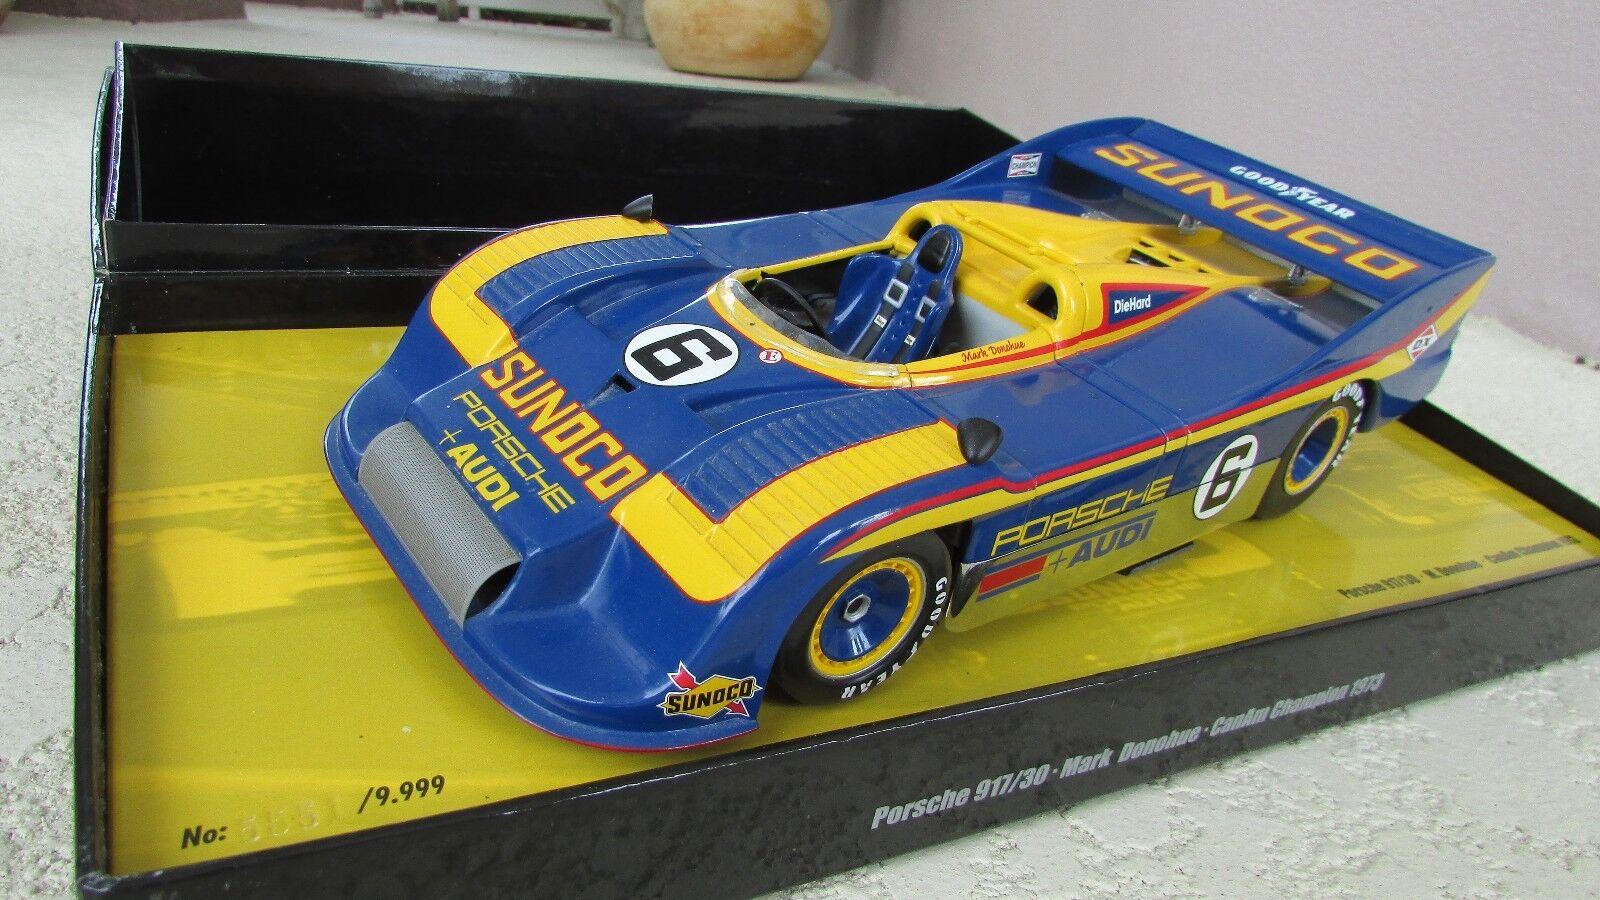 1973 Porsche 917 30 race car Mark Donohue Penske Sunoco Can Am Minichamps 1 18